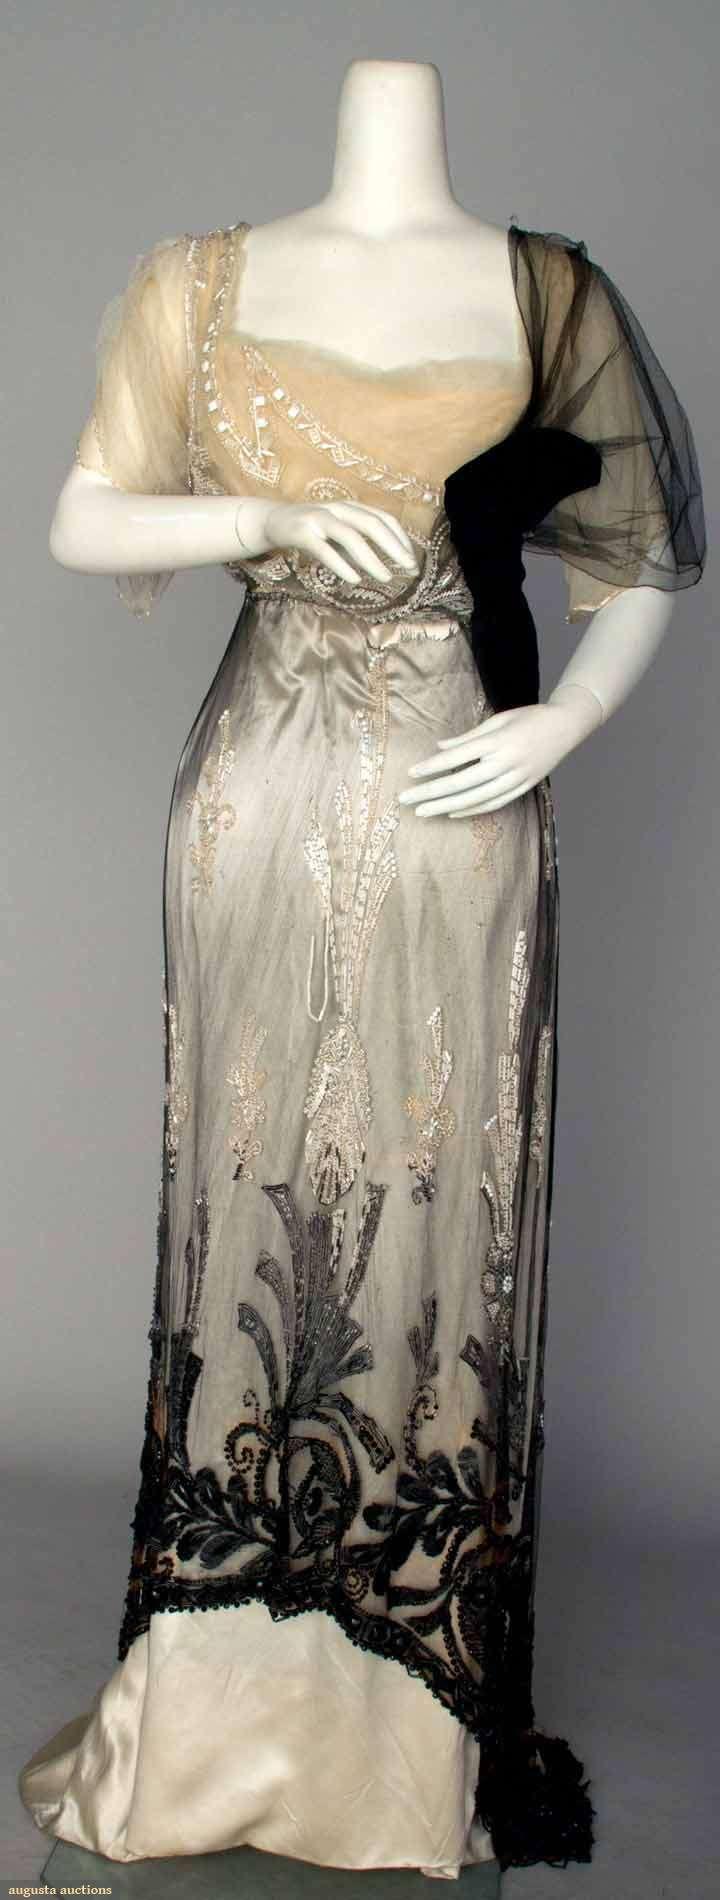 Augusta Auctions, April 17, 2013 - NYC, Lot 39: Paquin Evening Gown, Paris, Winter 1911